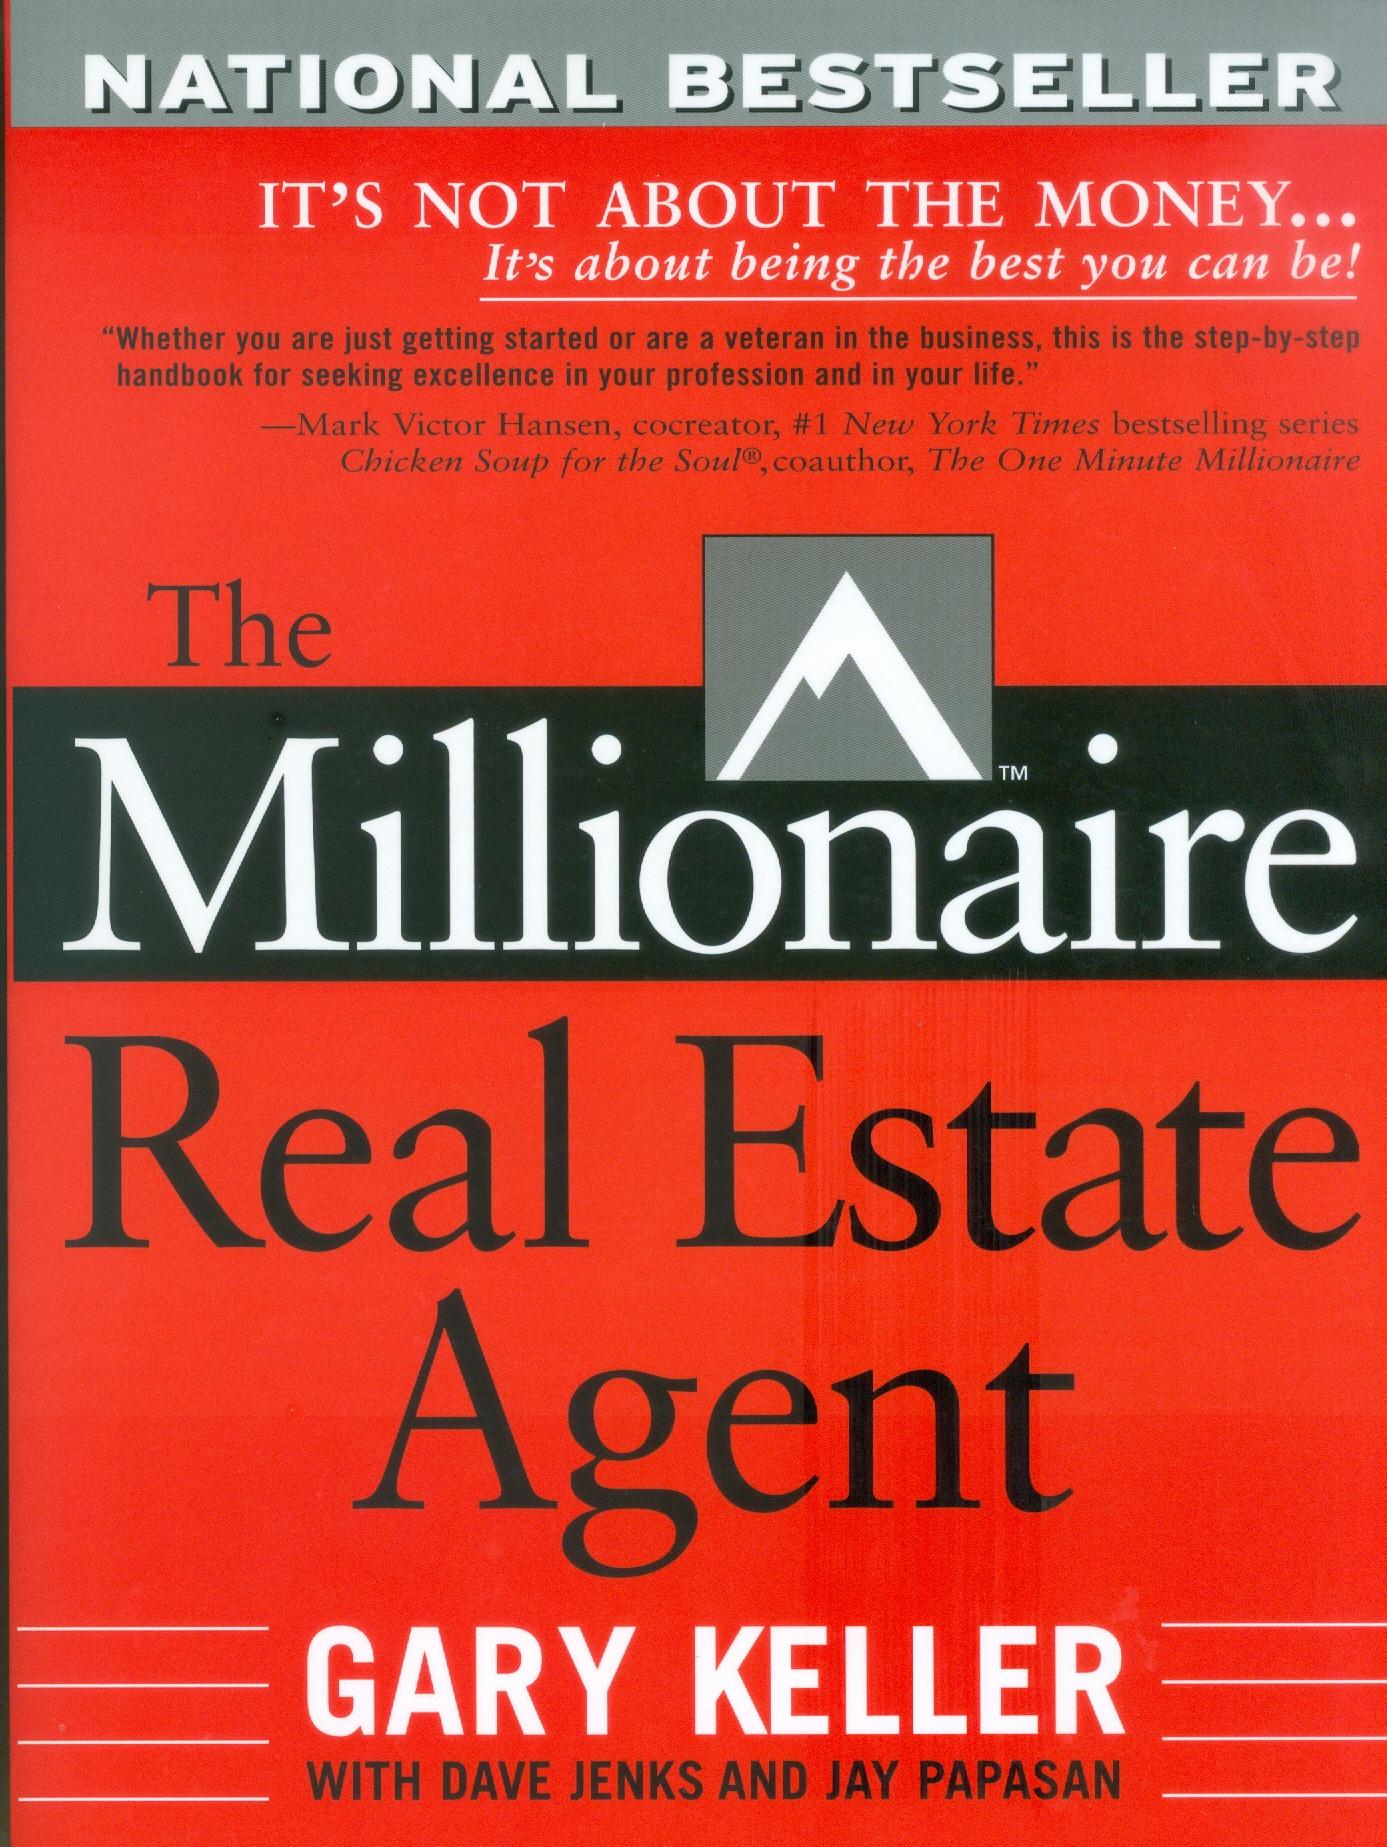 real estate agent0001.jpg